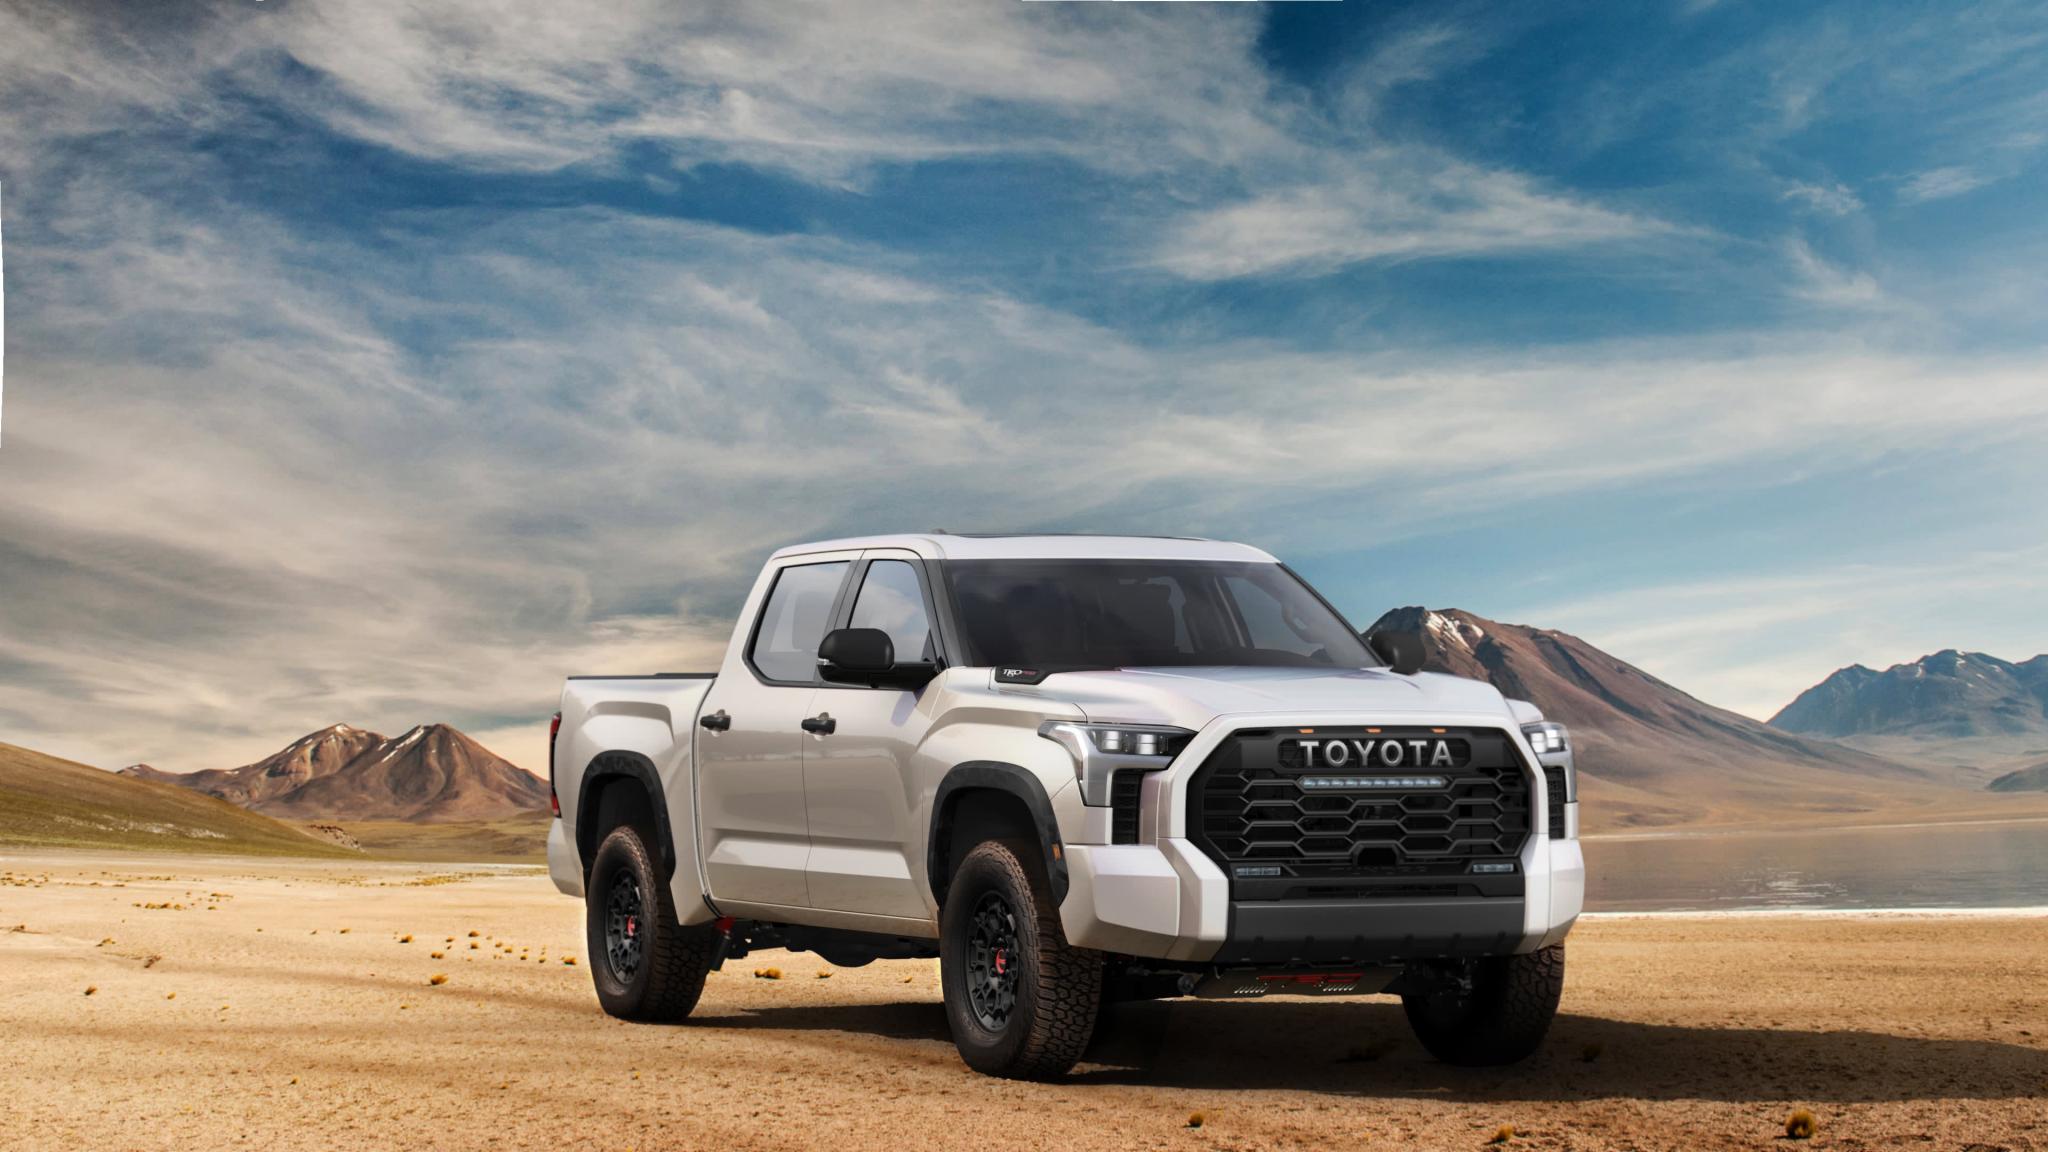 2020 Chevy Silverado = FUGLY-106943637-16318990434522022_toyota_tundra_front-quarter_023-jpg